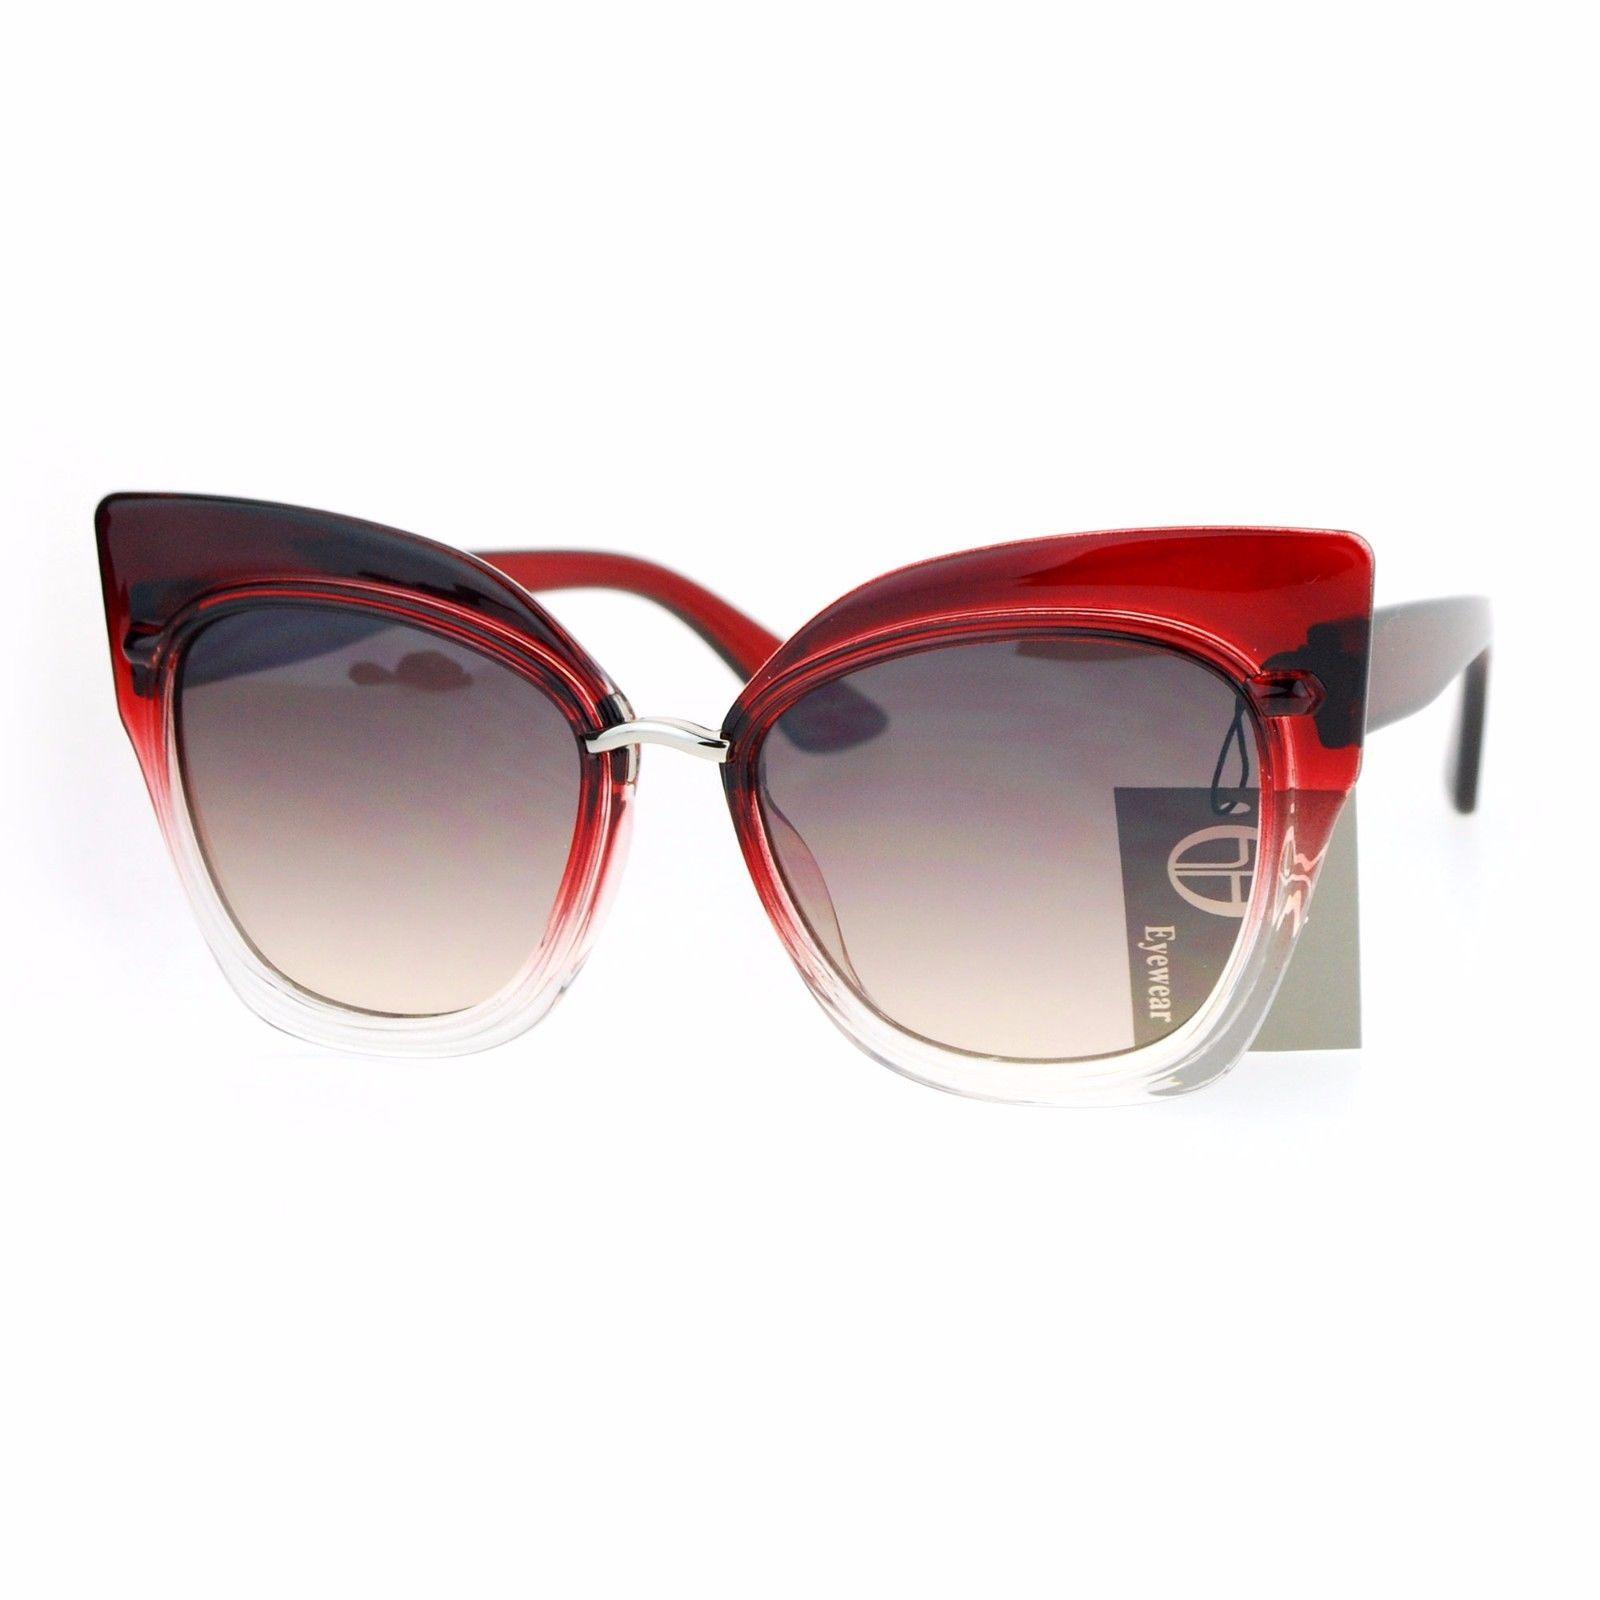 Oversized Fashion Sunglasses Womens Square Cateye Butterfly UV 400 image 3